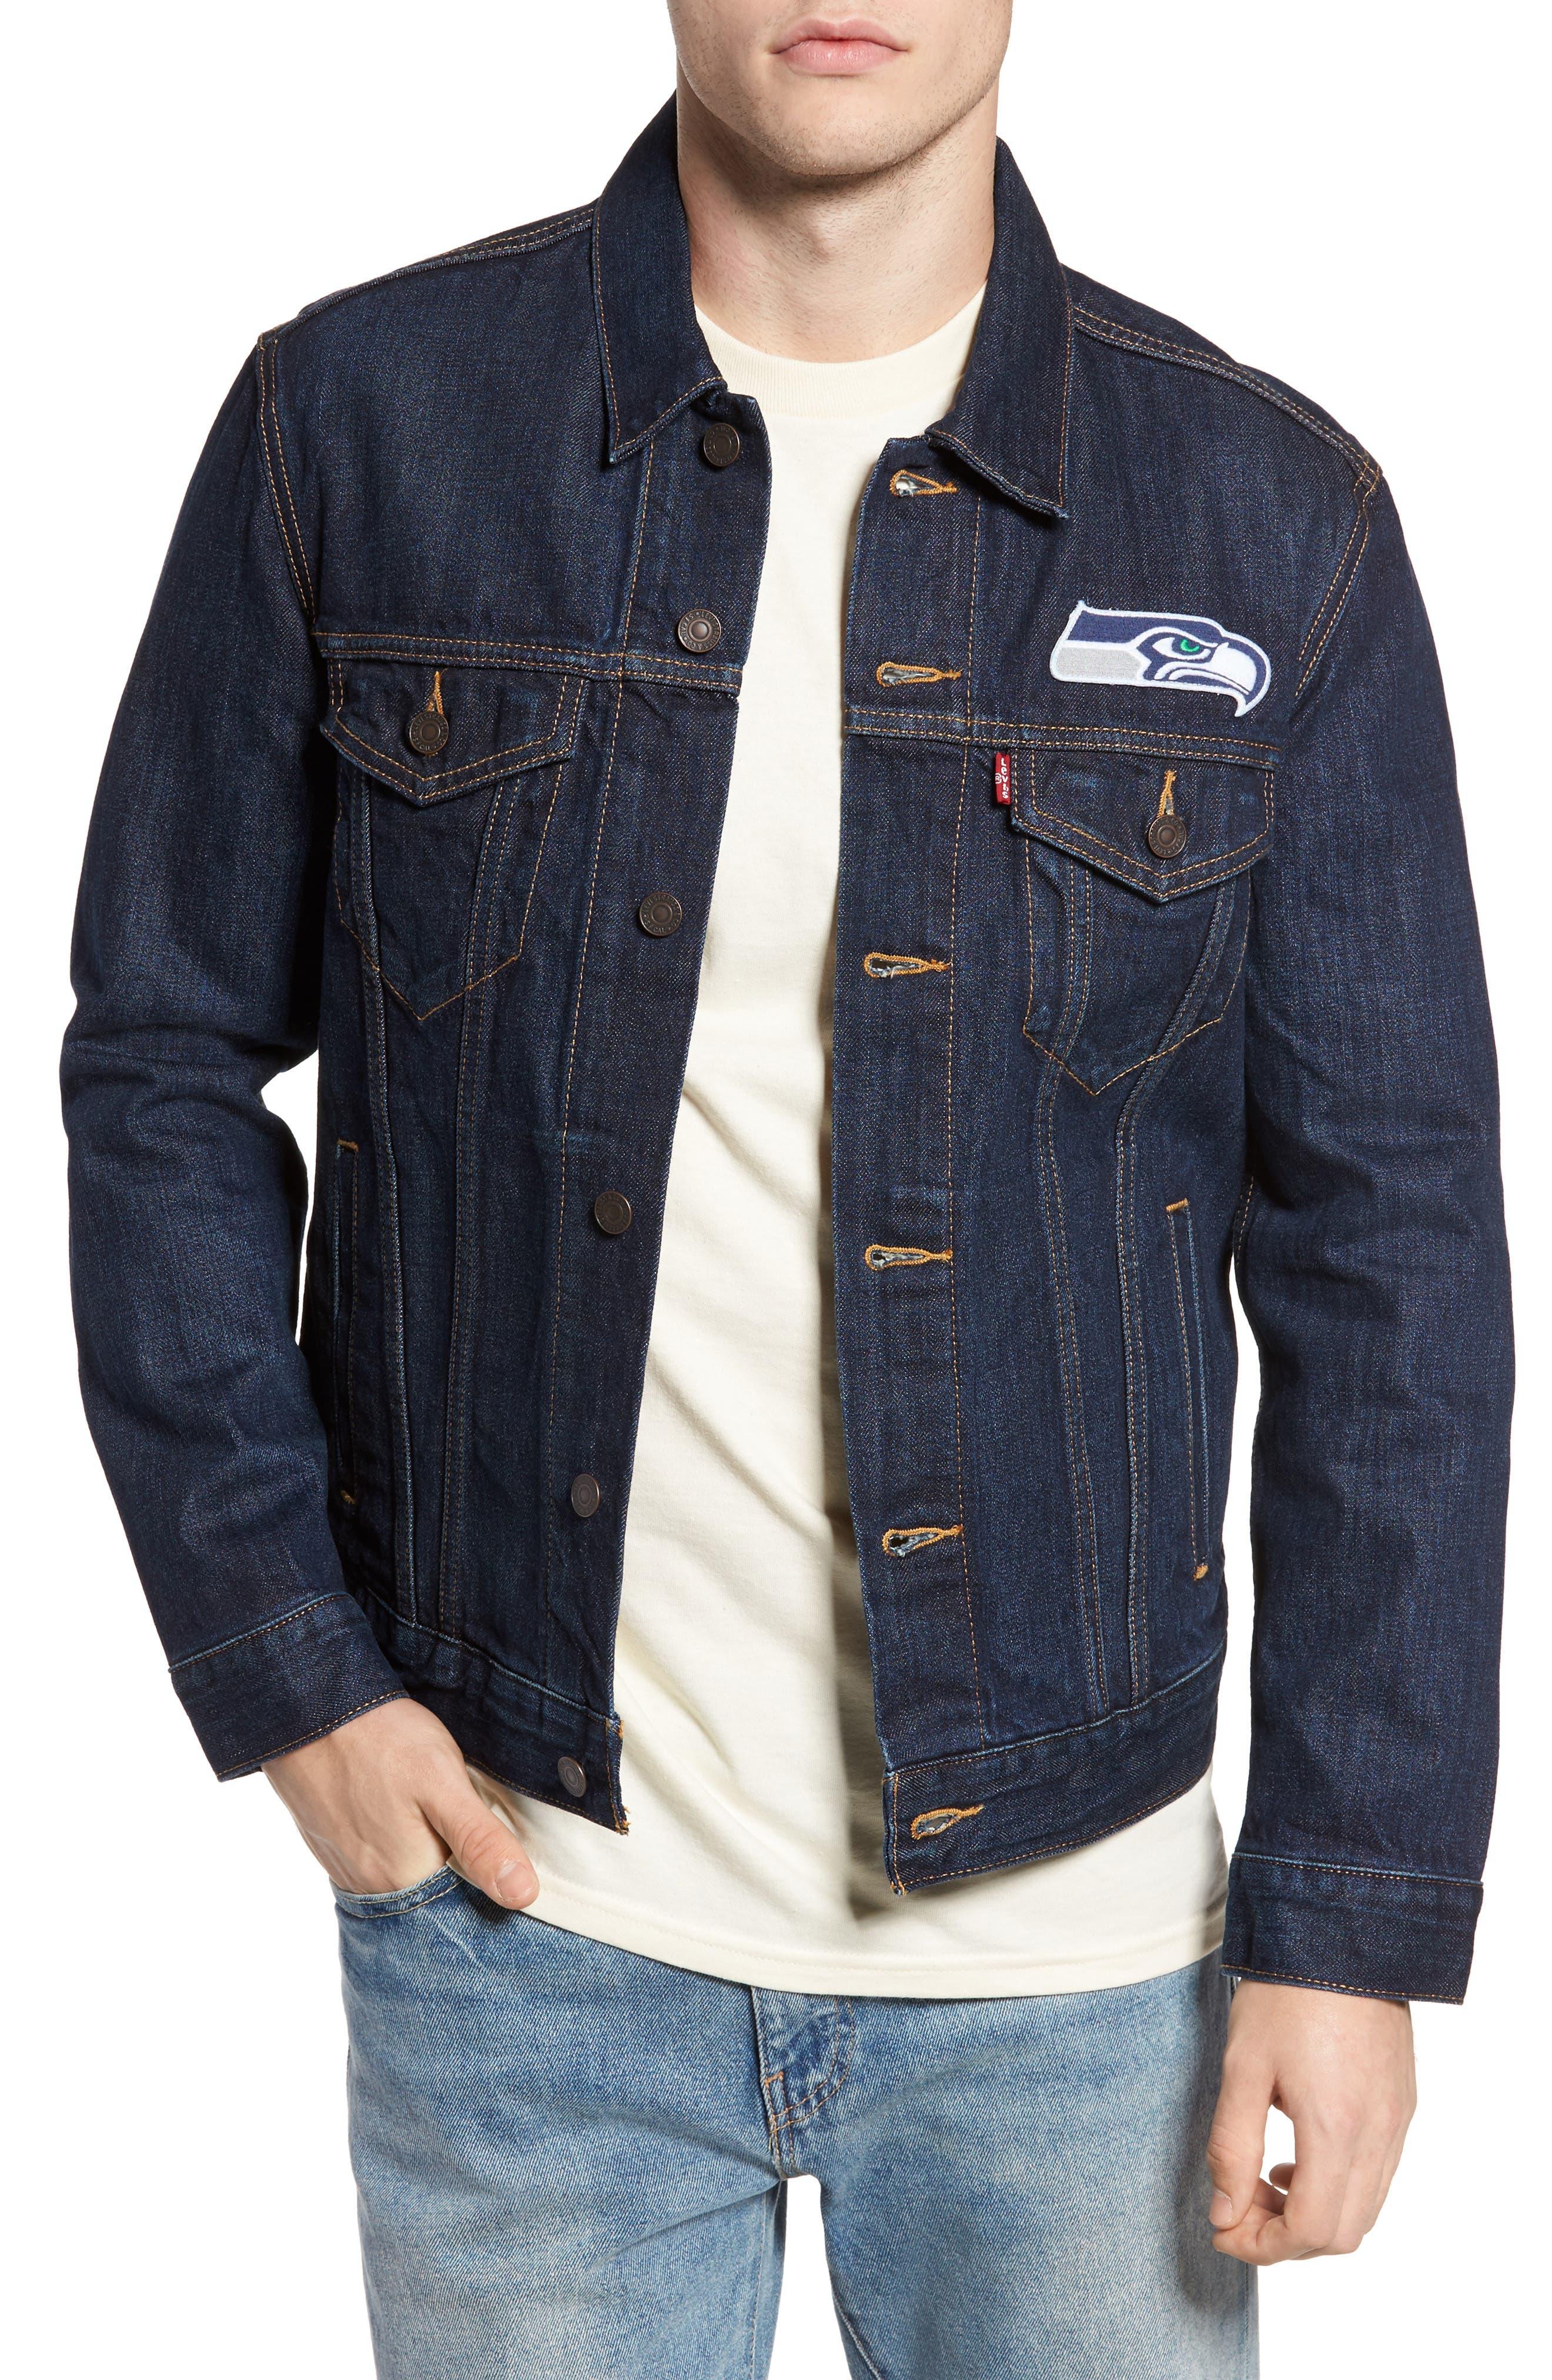 Alternate Image 1 Selected - Levi's® Seattle Seahawks Denim Trucker Jacket